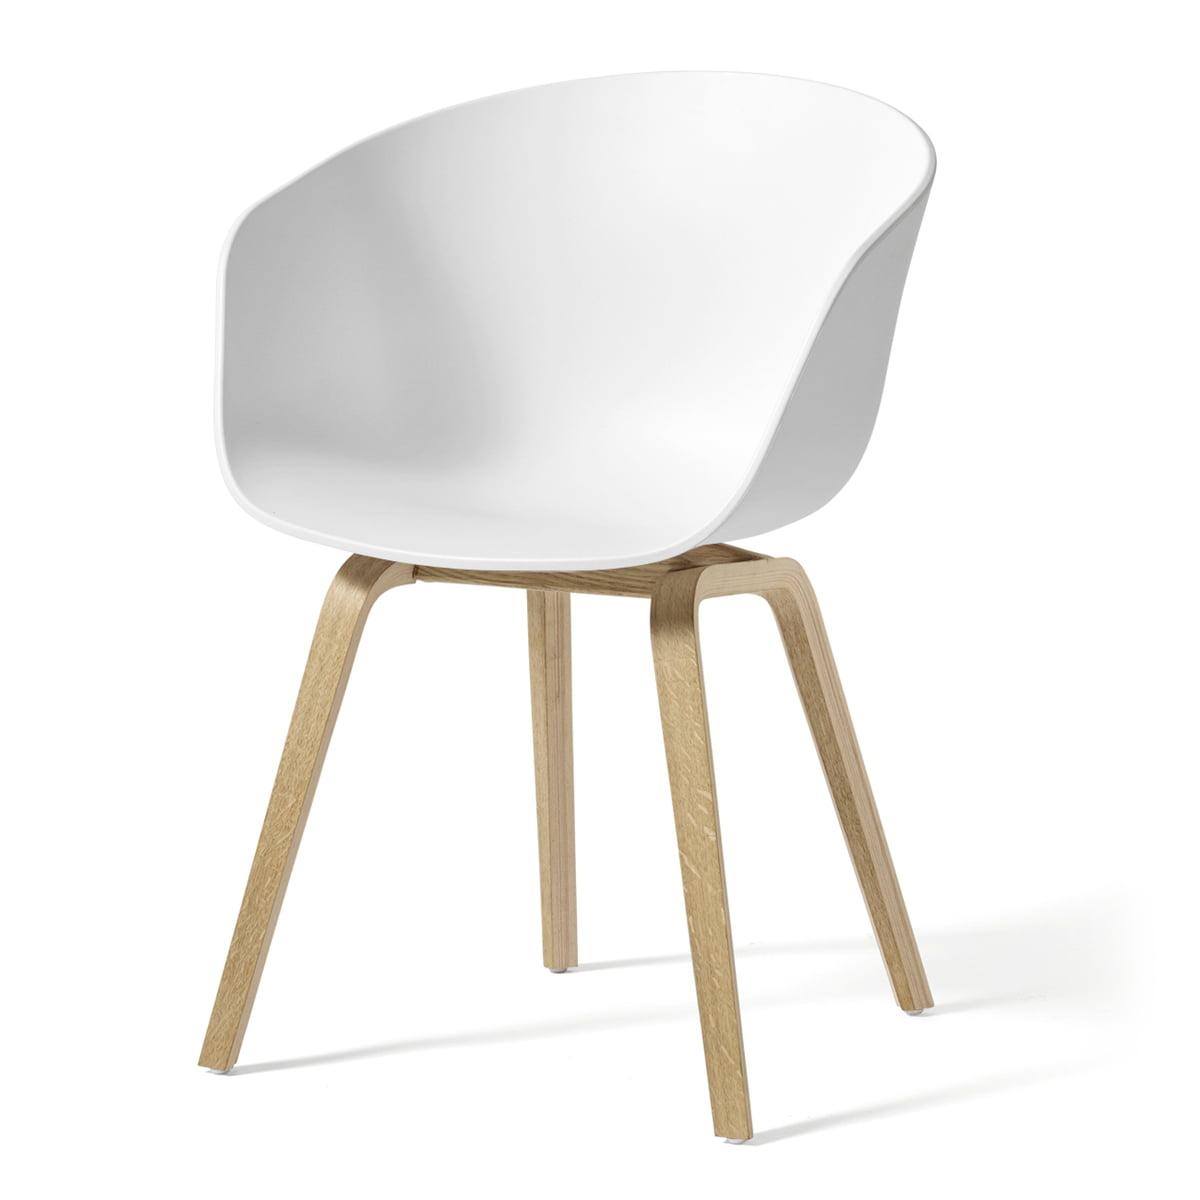 https://www.connox.de/m/100030/141346/media/hay/About-A-Chair/About-A-Chair-WeissNatur-Frei_1593.jpg